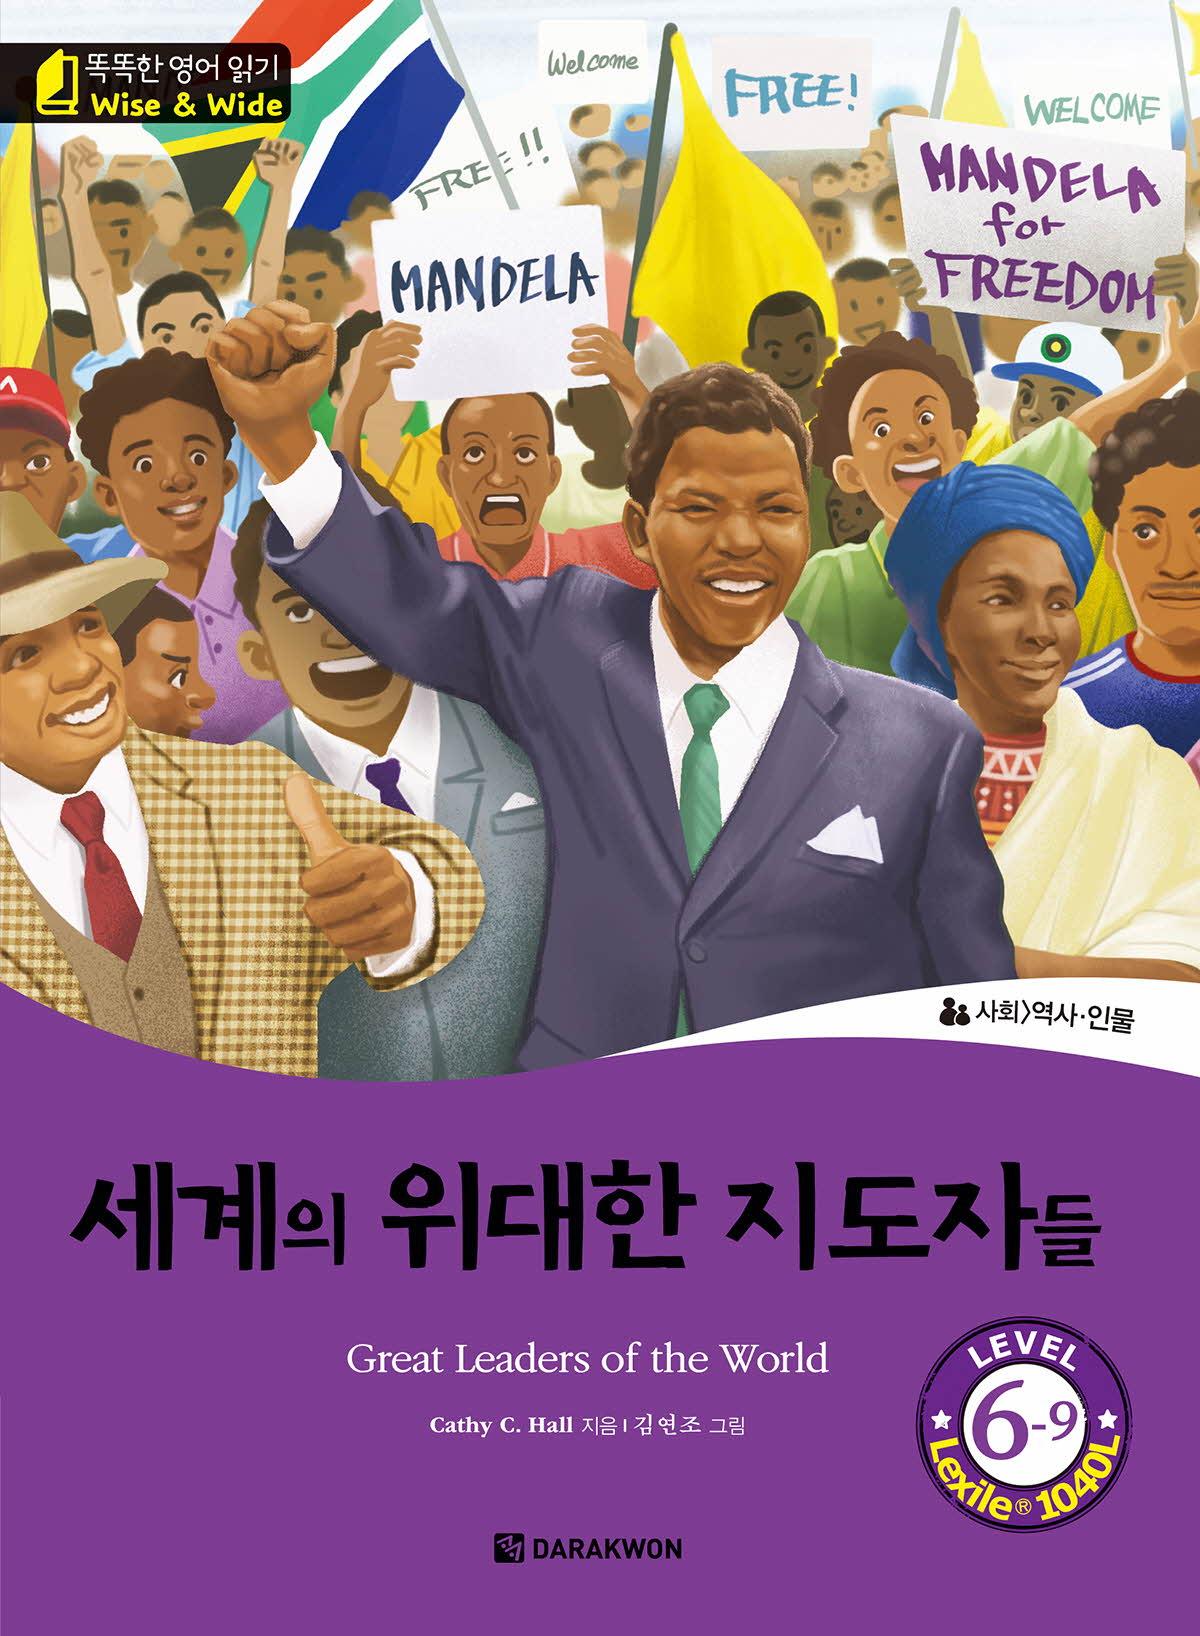 <a href='contents.php?CS_CODE=CS201803120059'>세계의 위대한 지도자들 (Great Leaders of the World)</a> 책표지